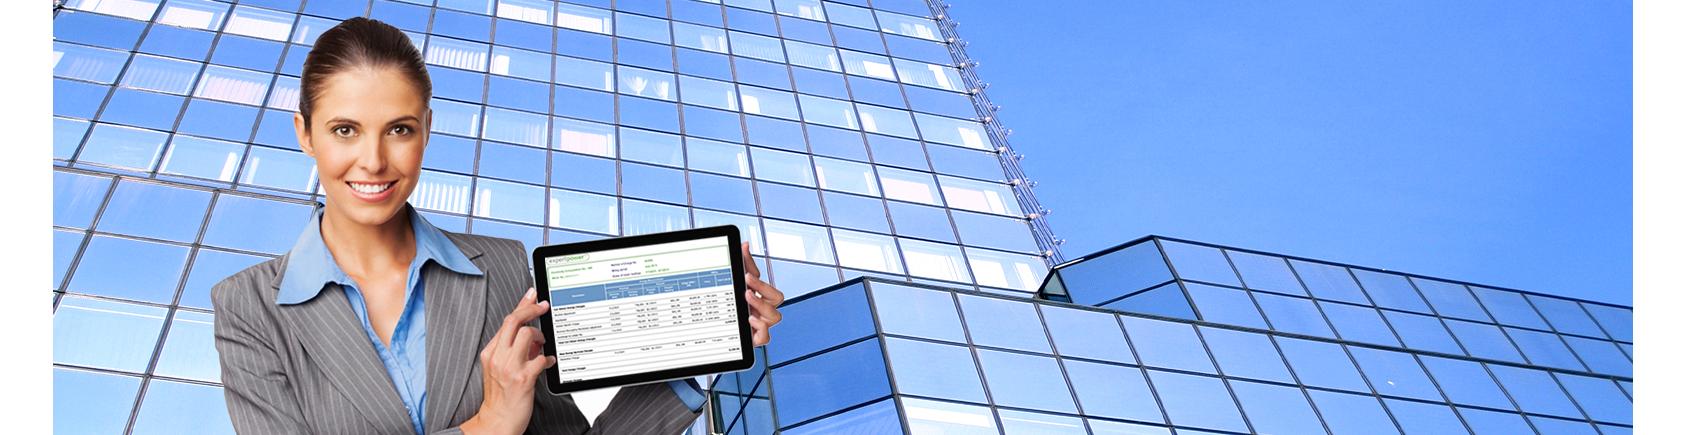 SATEC Billing & Revenue Metering Solutions